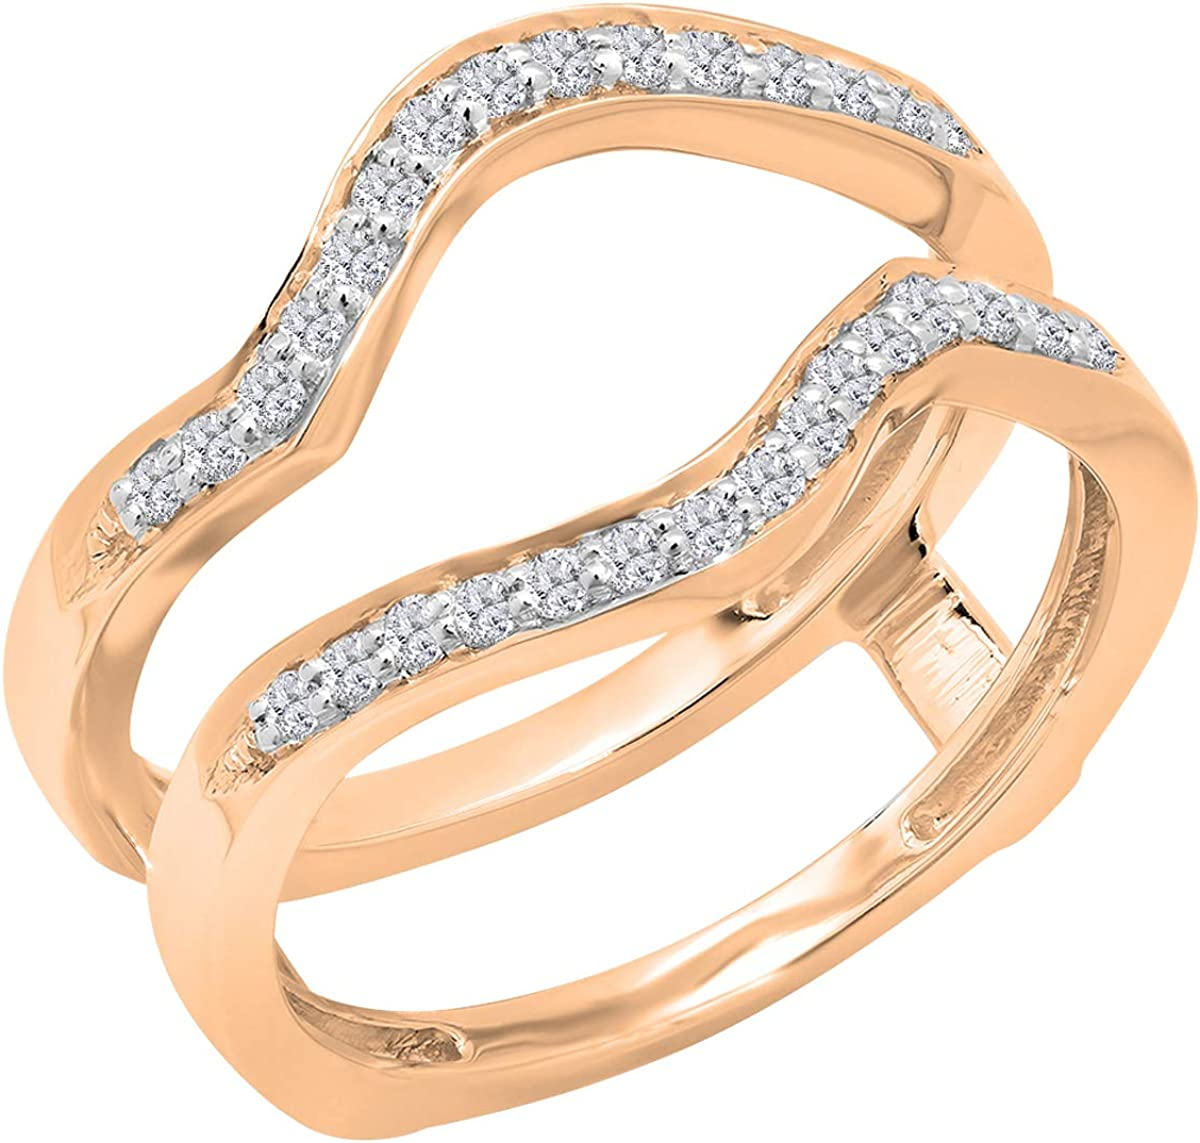 Dazzlingrock Collection 0.25 Carat (ctw) Round White Diamond Ladies Wedding Contour Enhancer Double Guard Band 1/4 CT, 10K Gold